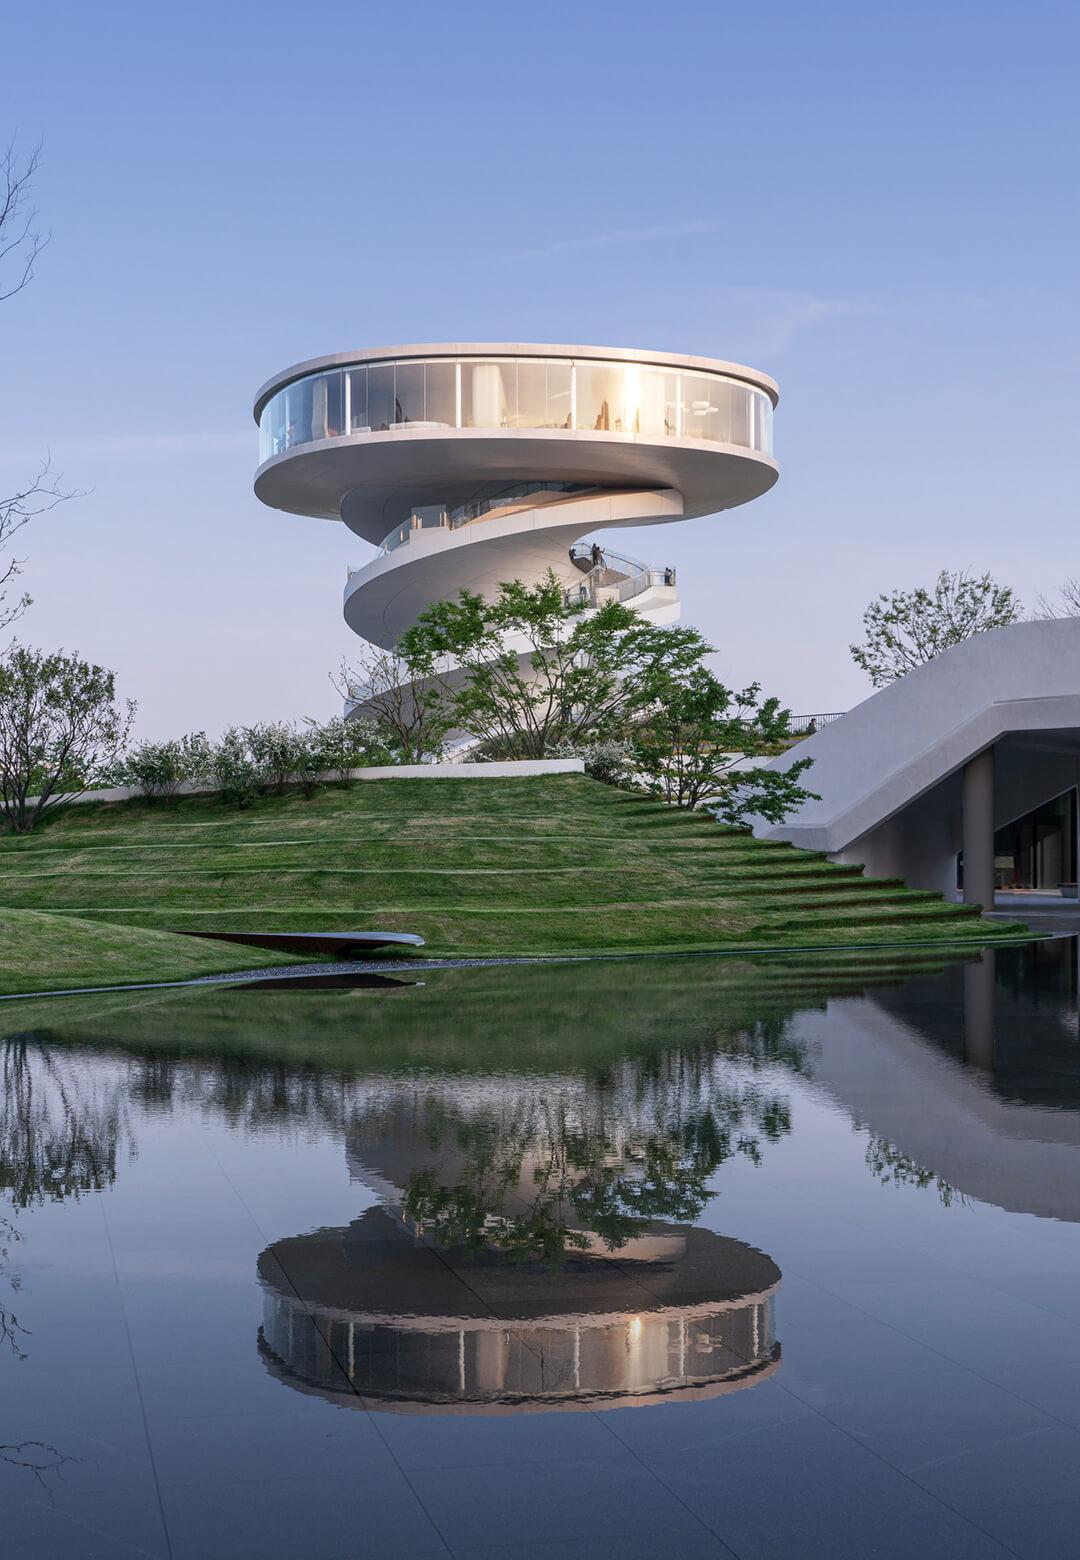 Norwegian practice Nordic - Office of Architecture completes Nanchang Waves in Nanchang City, China   Nanchang Waves by Nordic – Office of Architecture   STIRworld